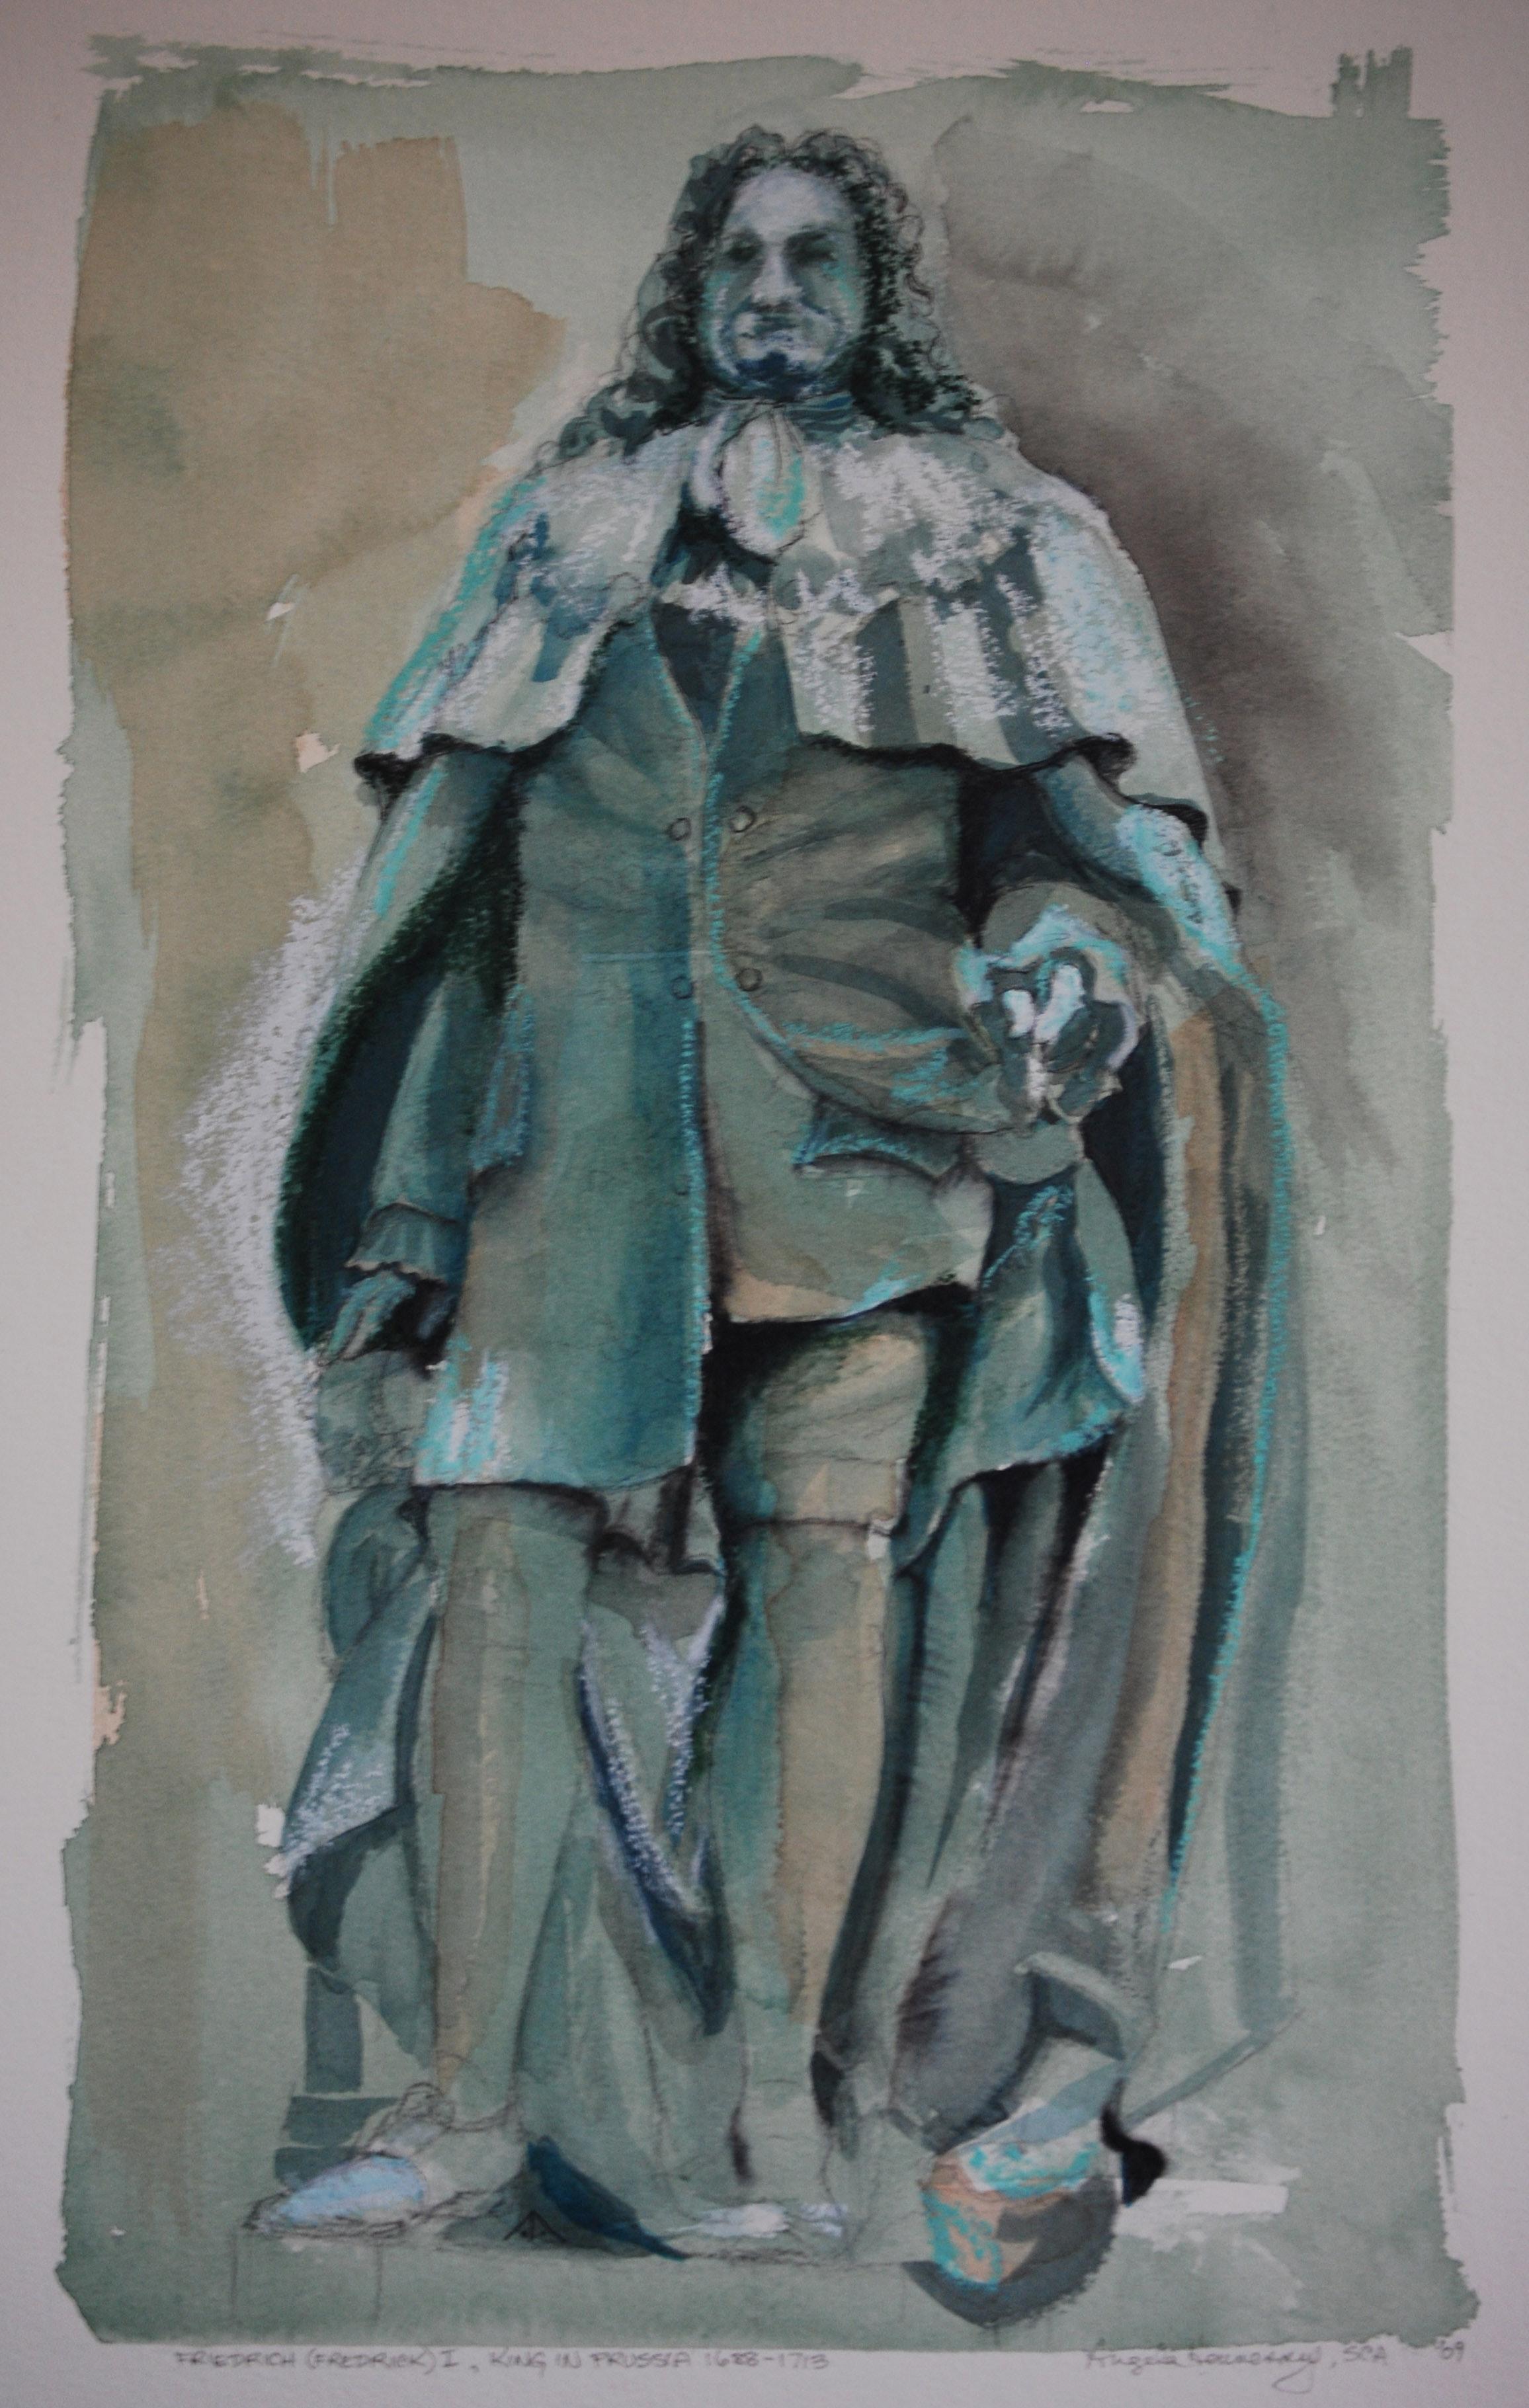 Friedrich I, King in Prussia